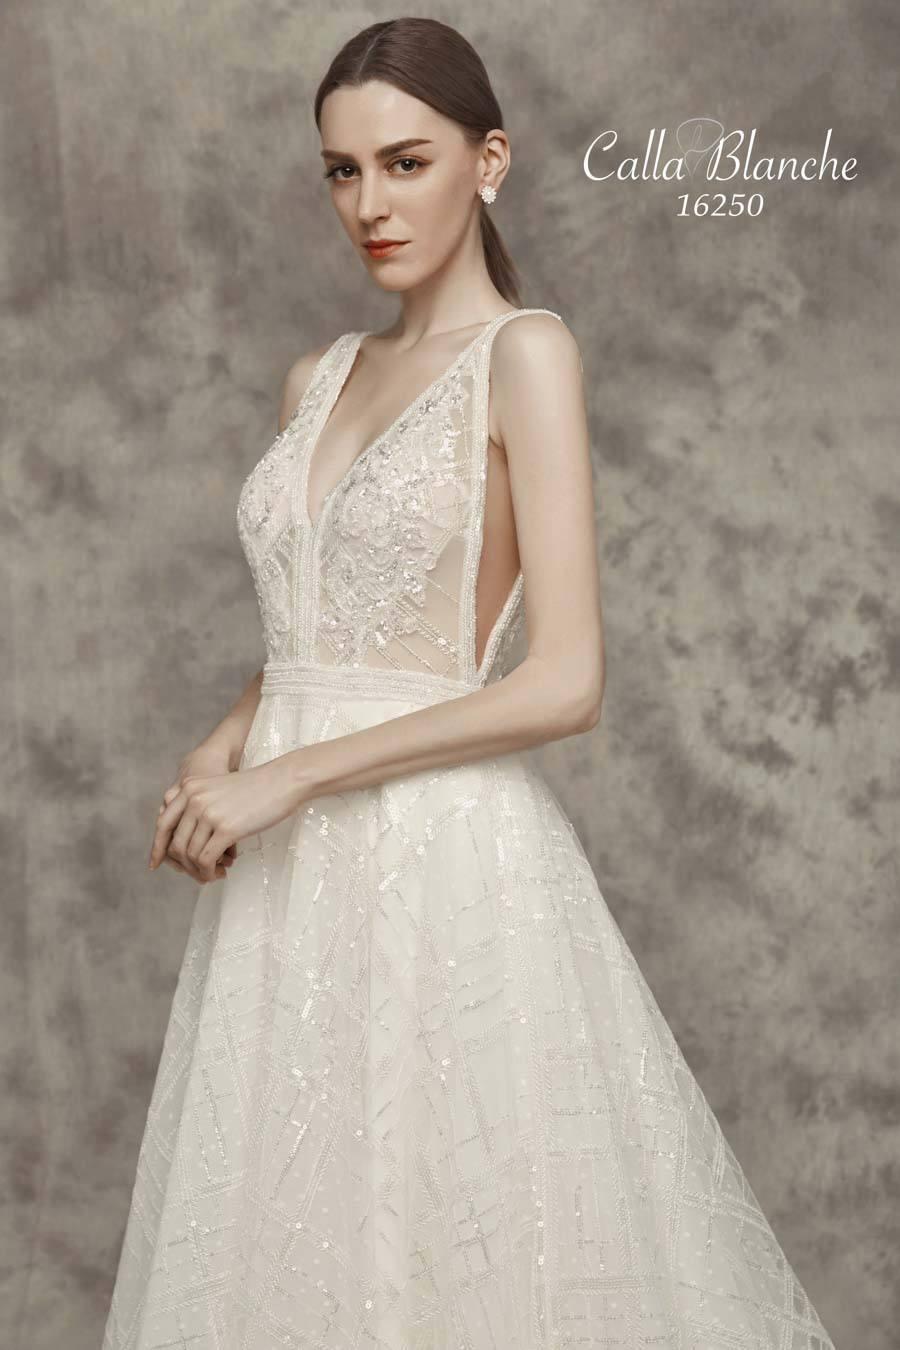 Wedding Dress Collection & Design - White Swan Bridal